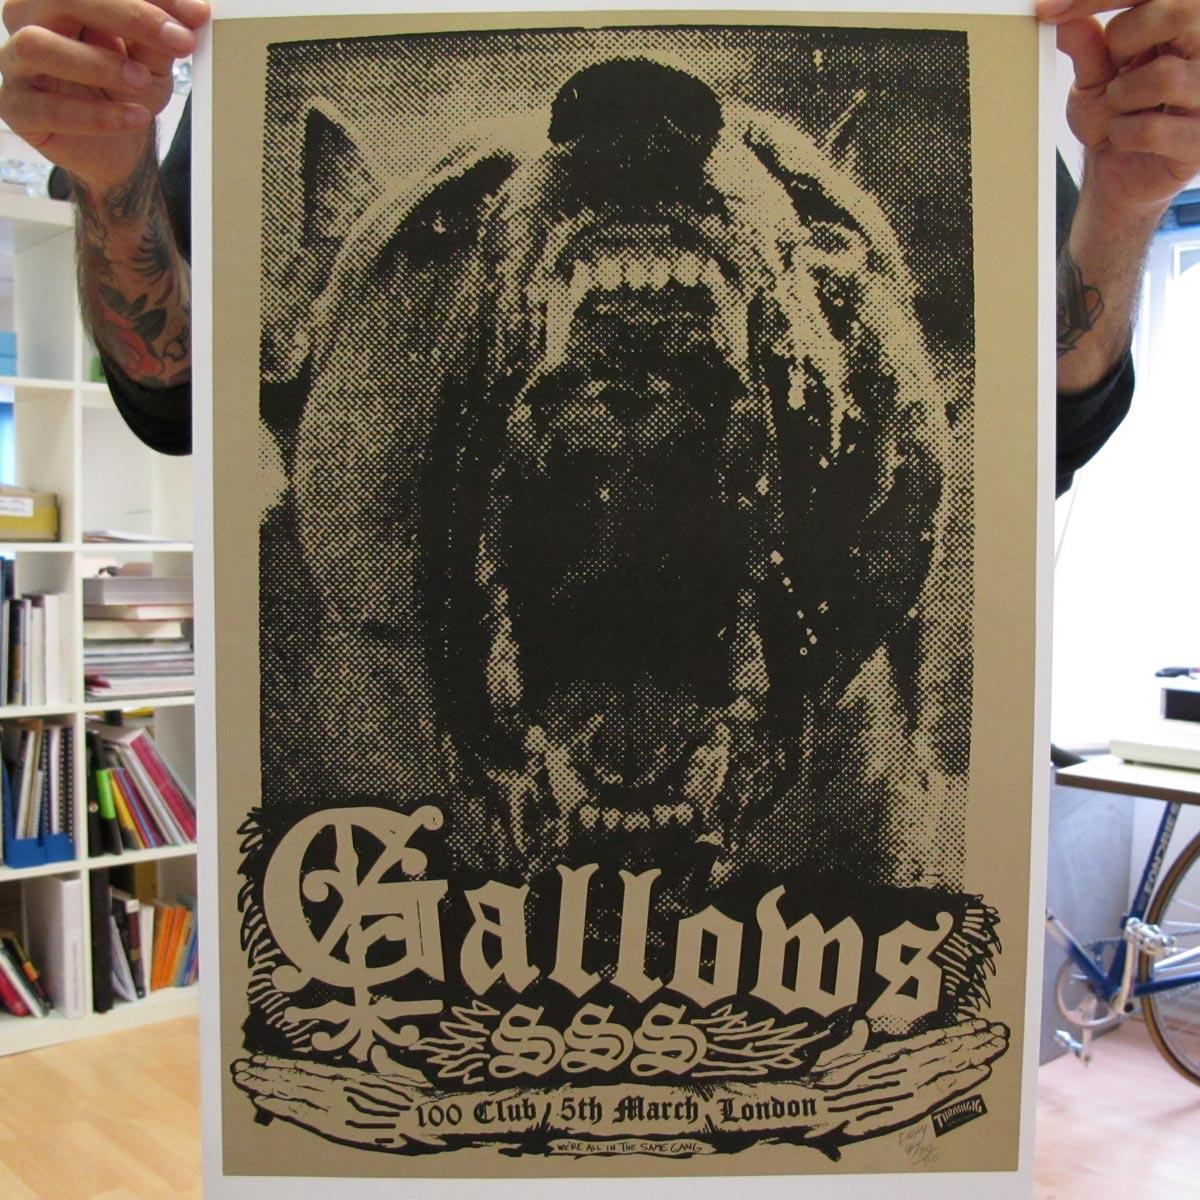 100 Club - March, 2008 - Gallows Poster - Venn Records